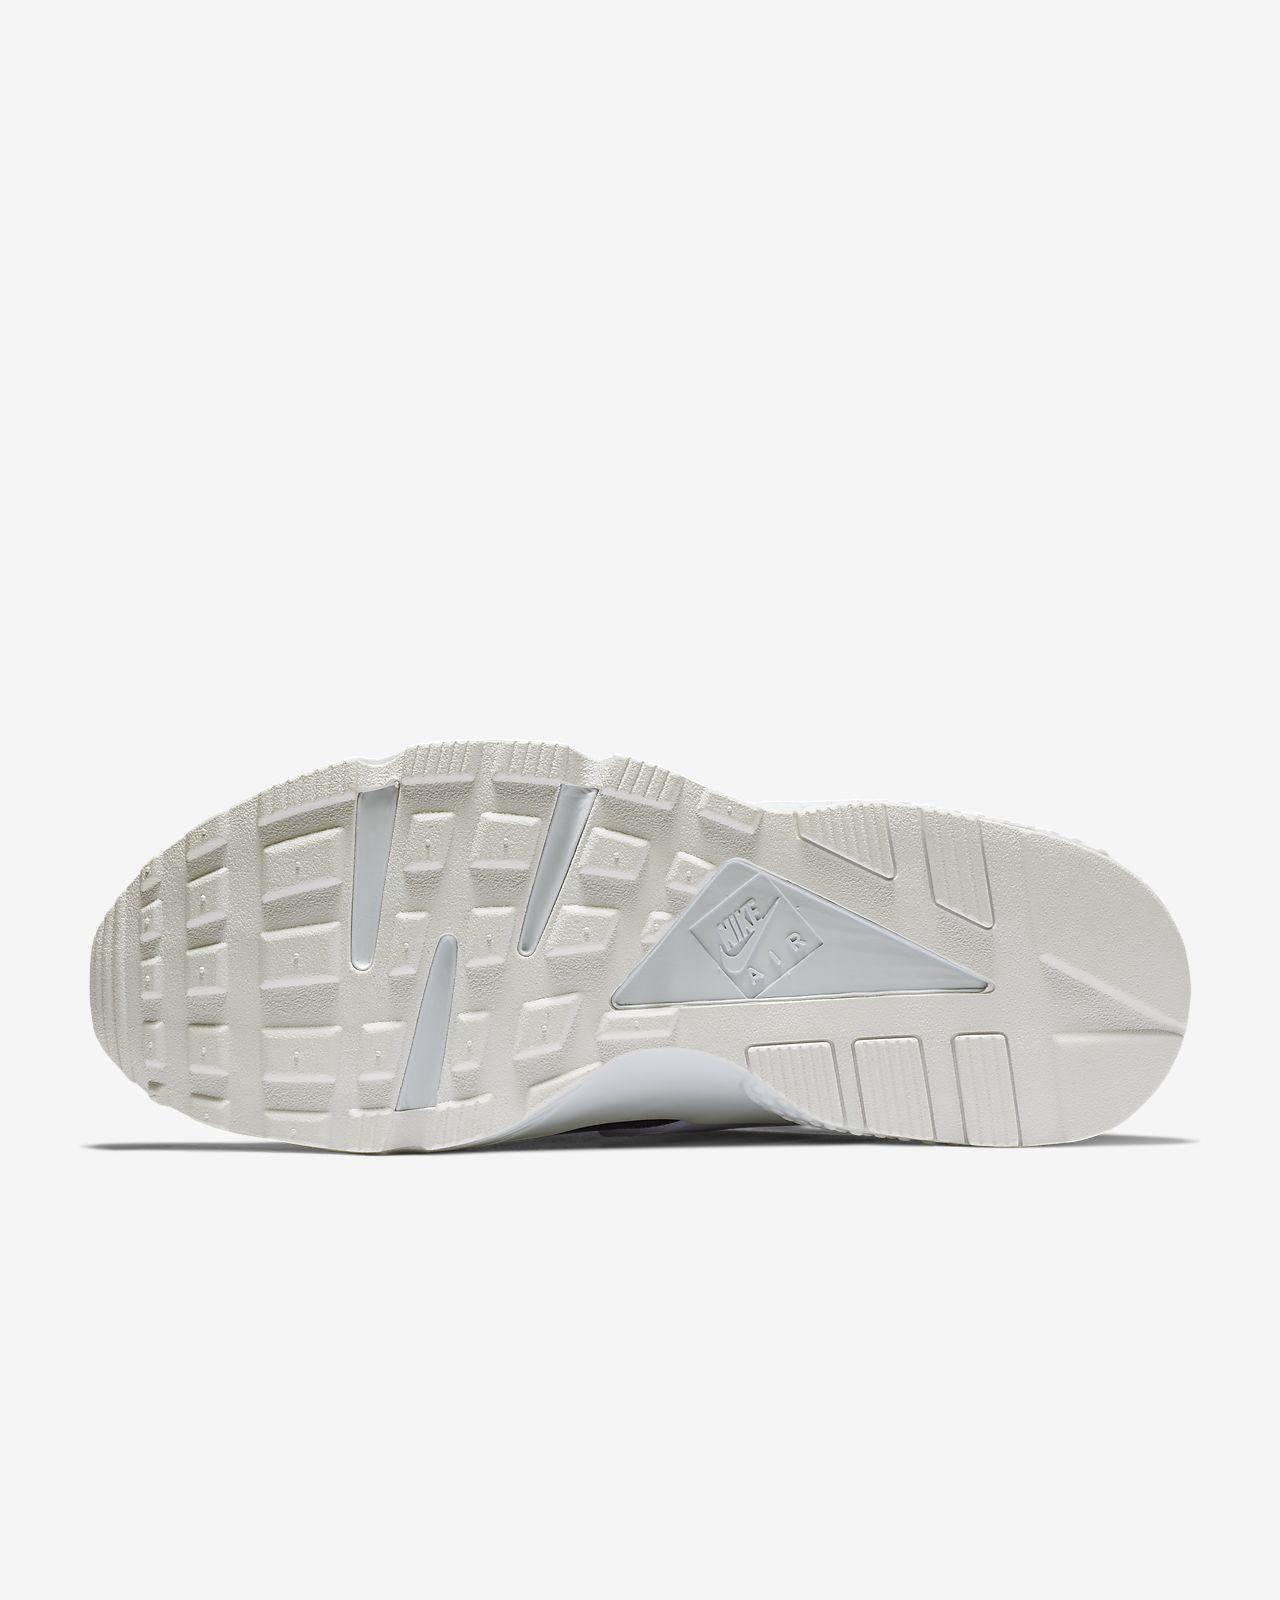 5aeff02cf78f Nike Air Huarache Run Premium Zip Men s Shoe. Nike.com ID